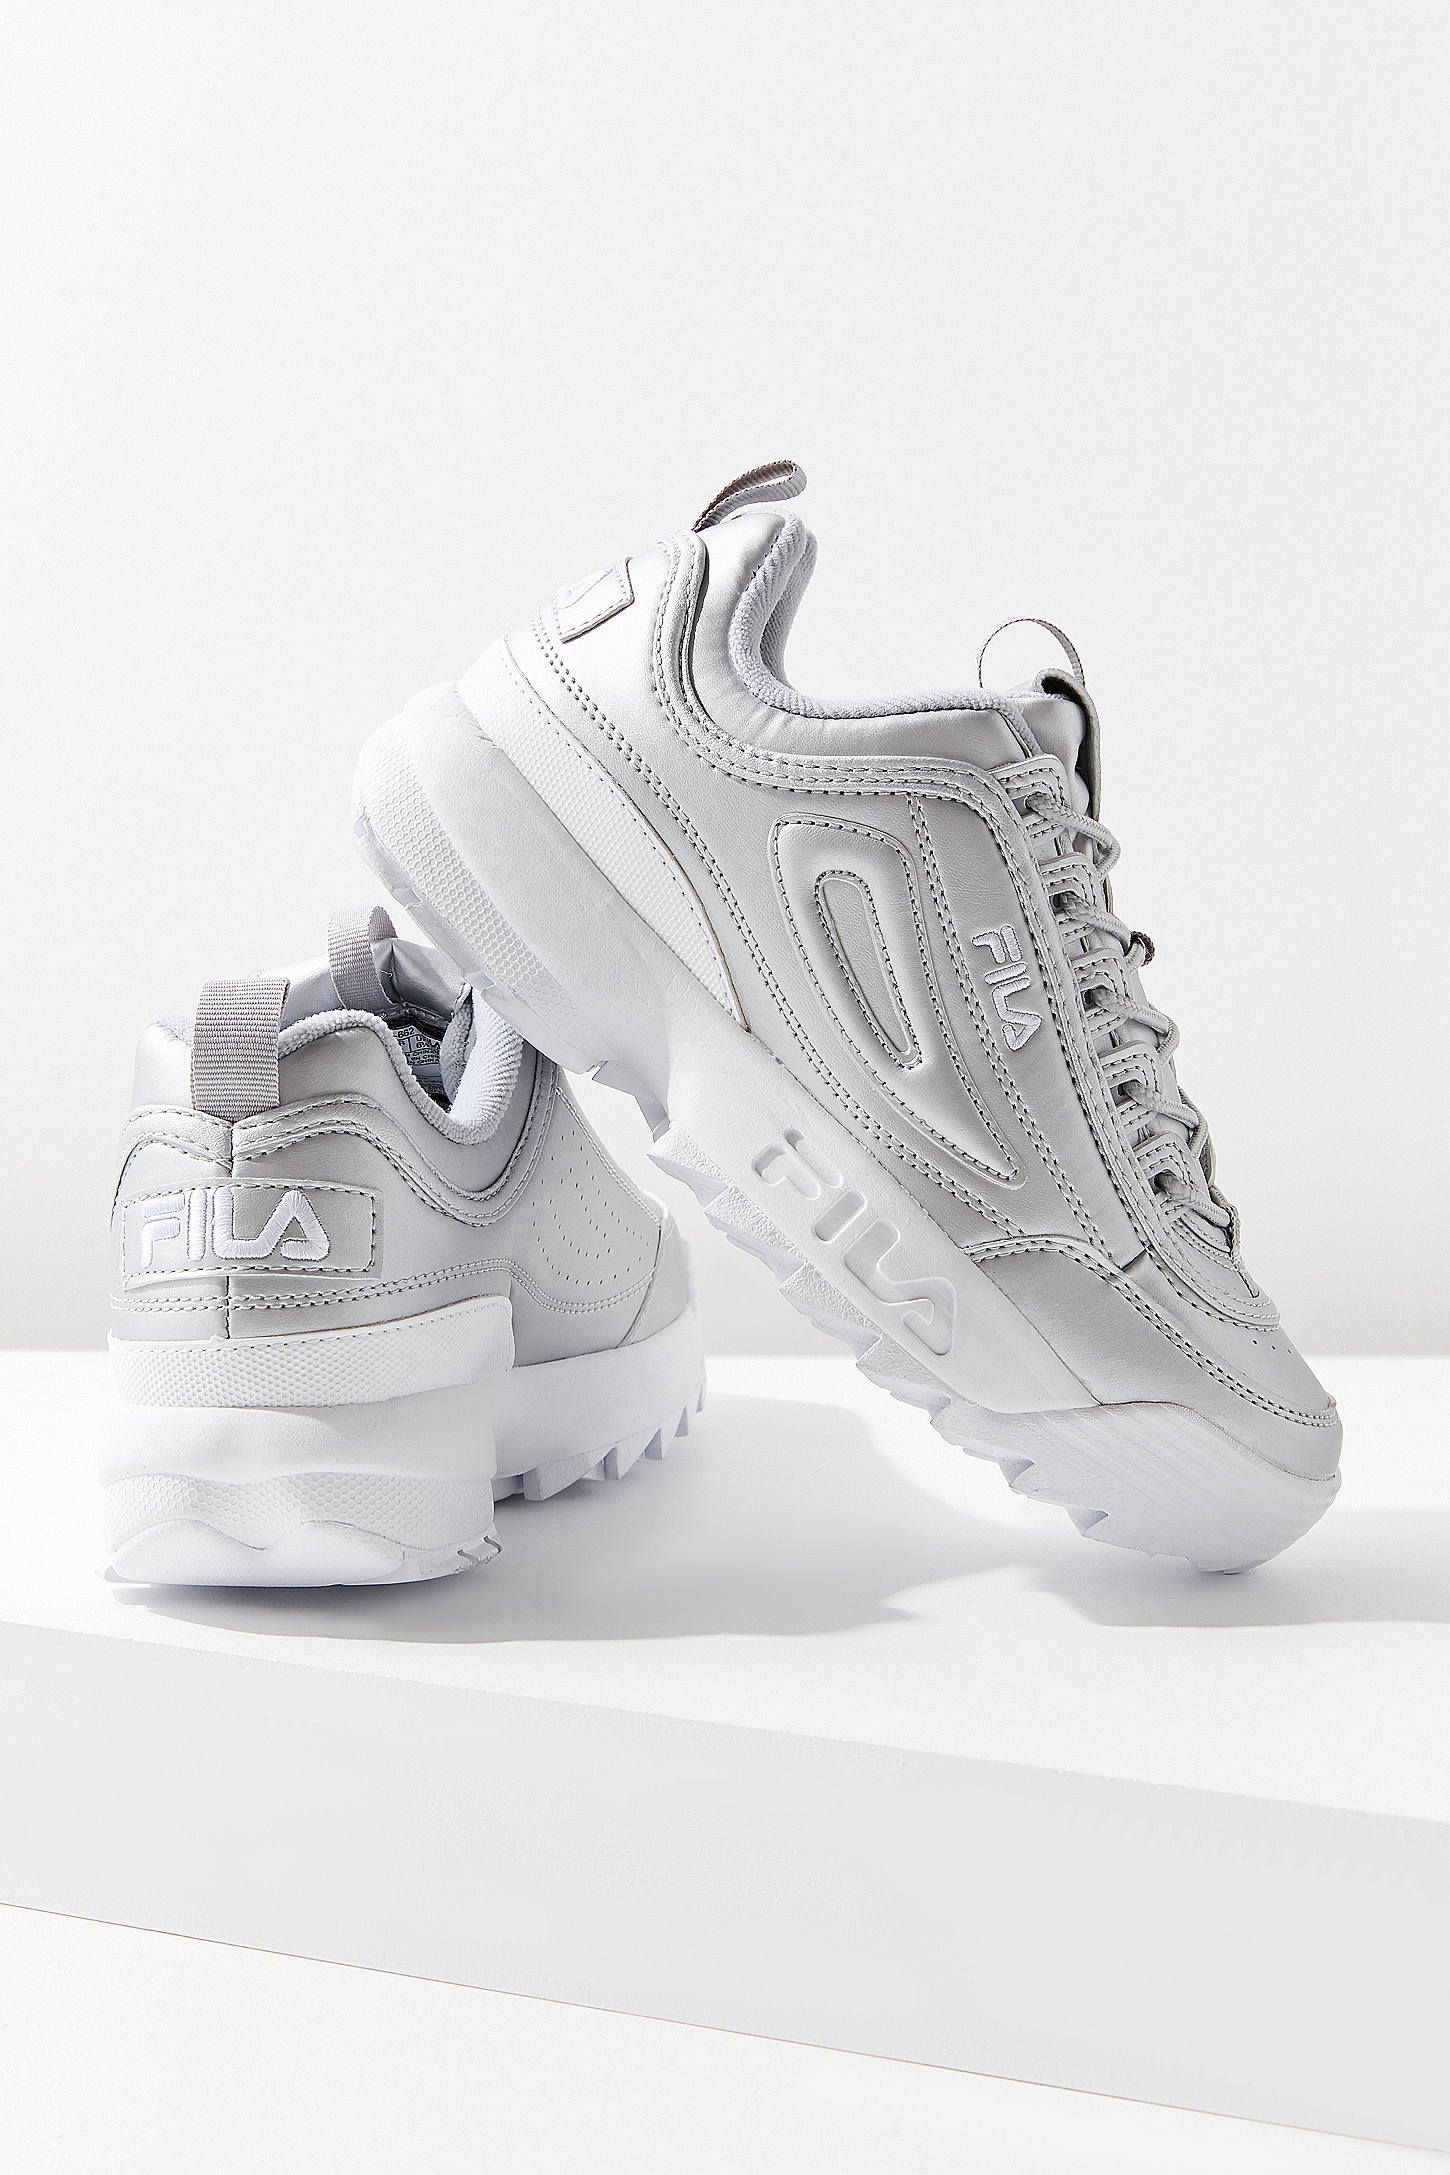 1f8849c695227 FILA Disruptor II Metallic Sneaker | Chaussure | Chaussure ...